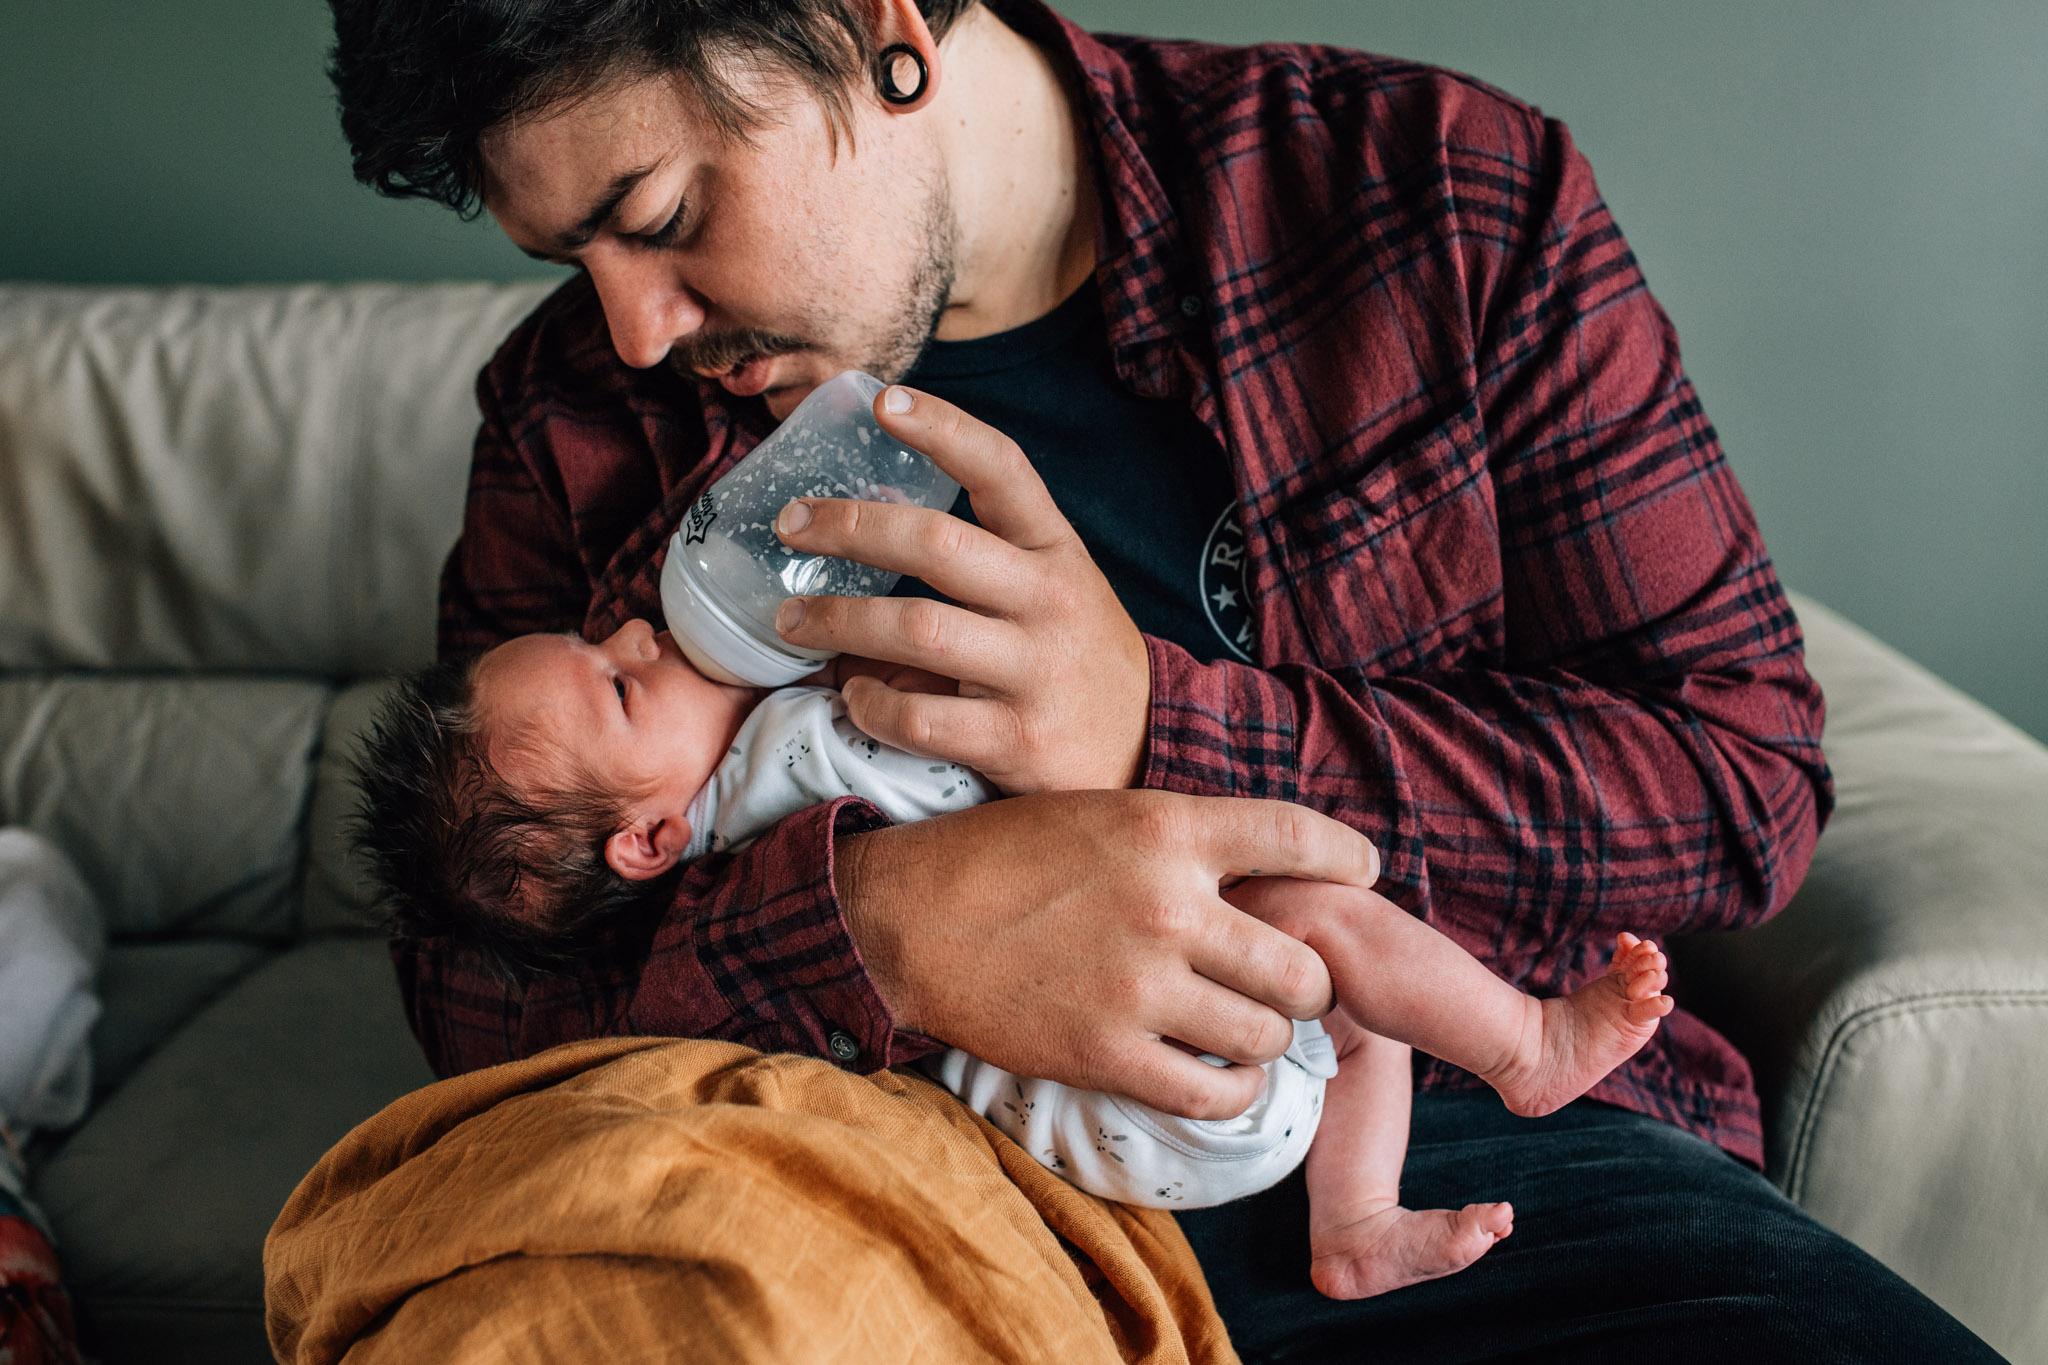 father-bottle-feeding-baby (1 of 1).jpg